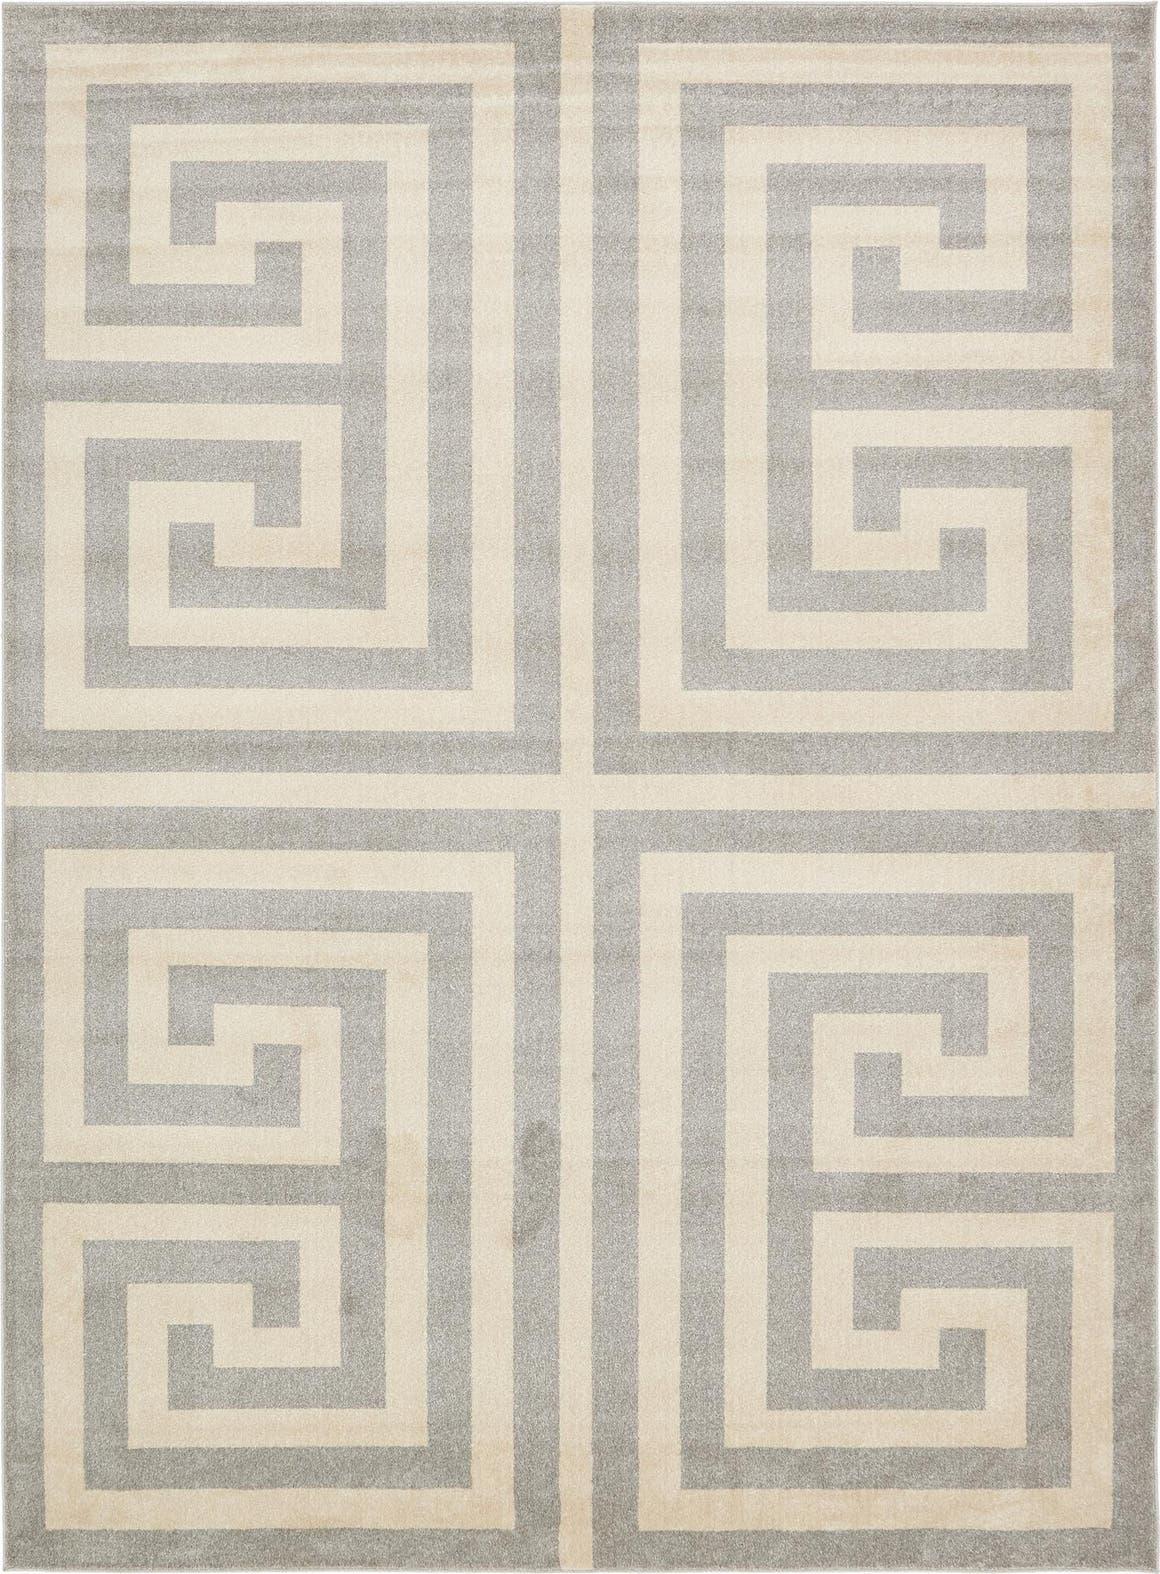 10' x 13' Greek Key Rug main image